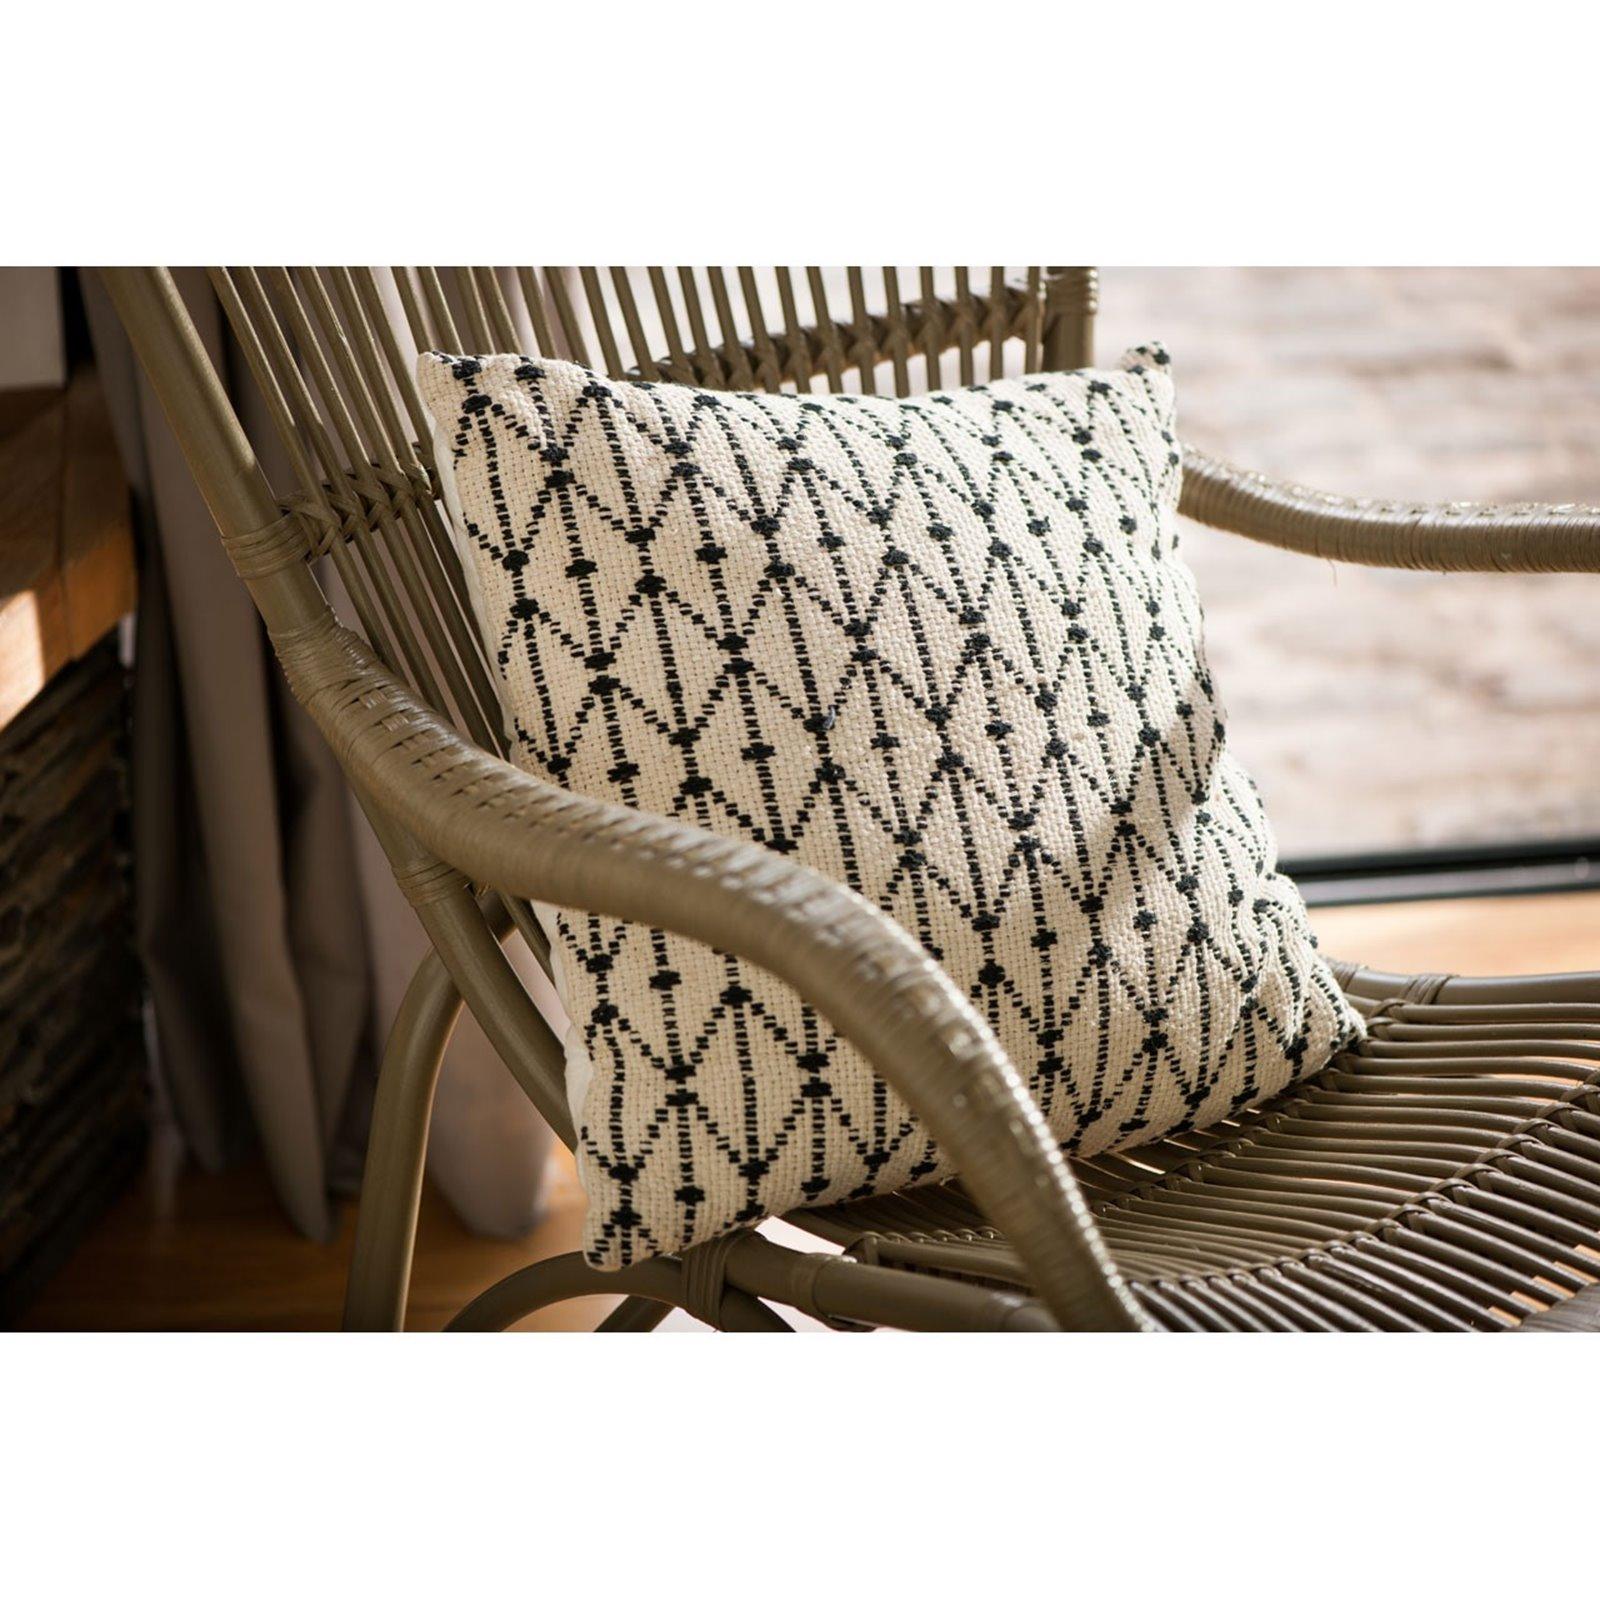 Grey Rattan Armchair and Footstool